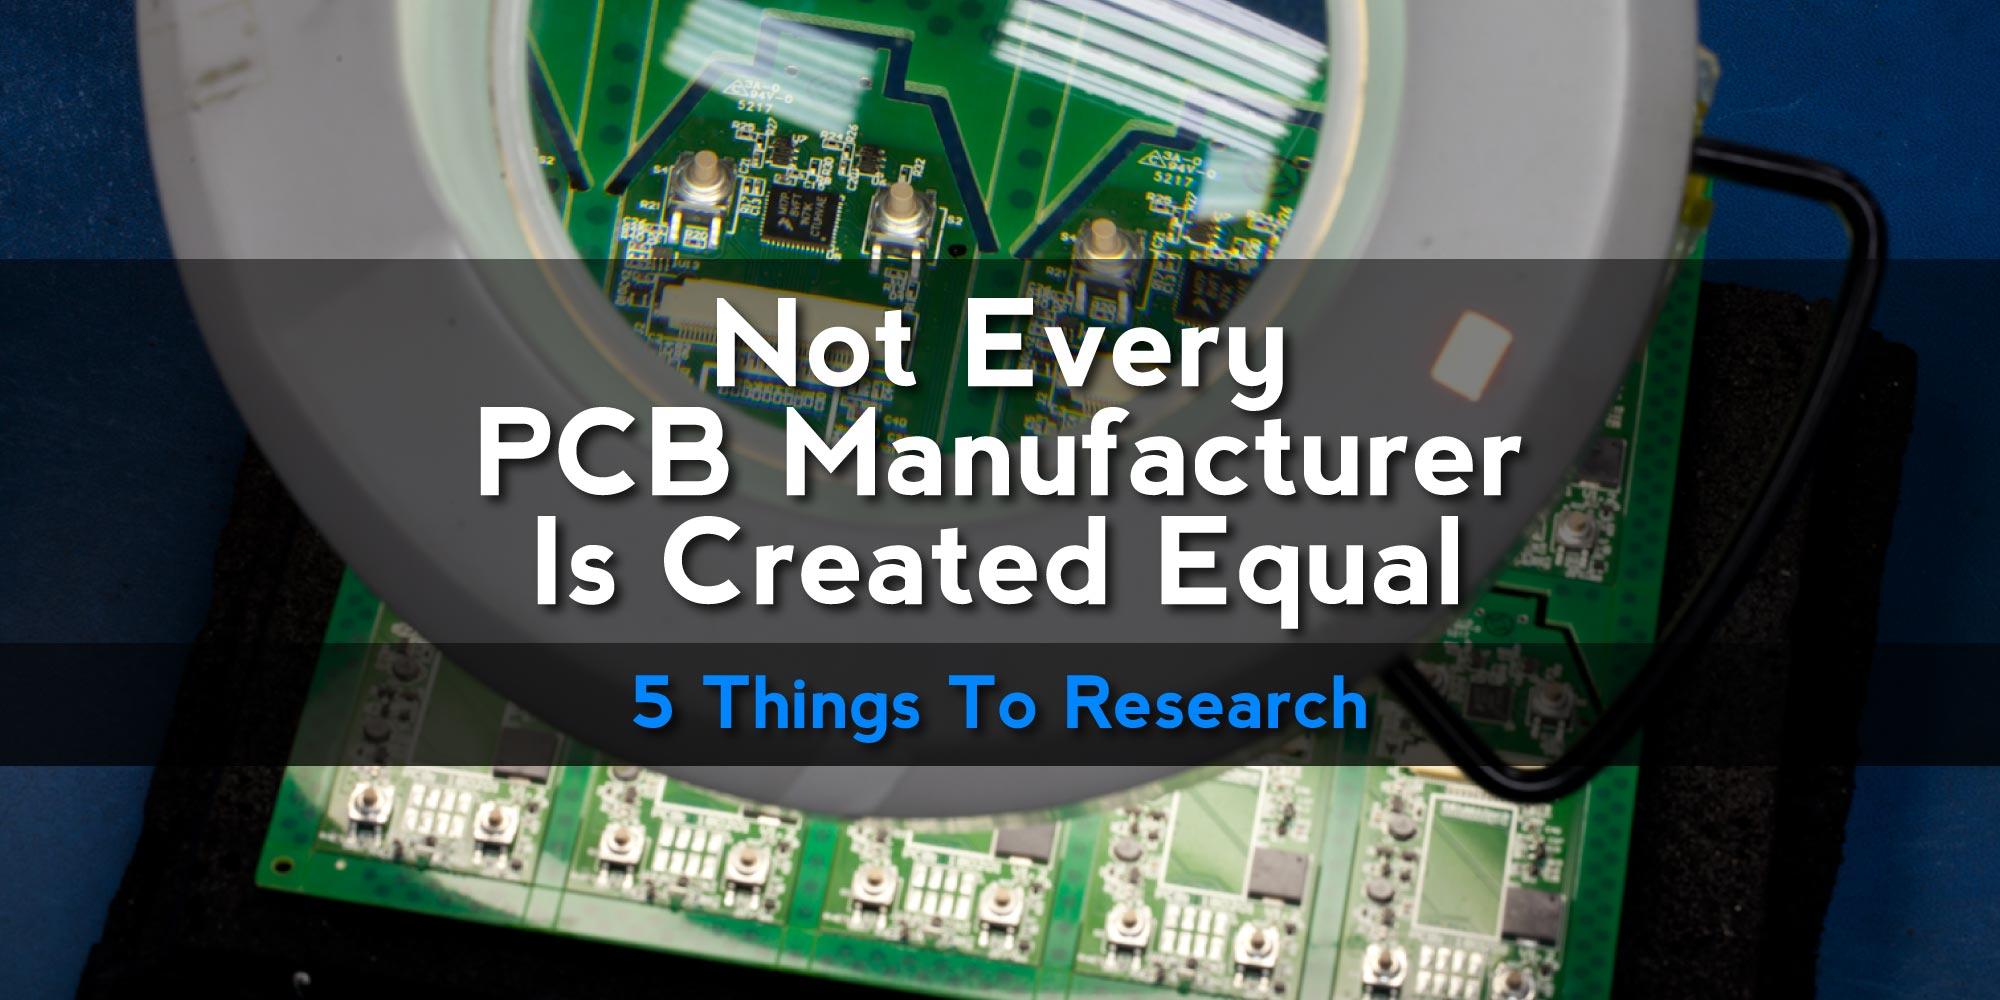 Electronics Manufacturing Blog - PCB, PCBA, Cable Assemblies, SMT